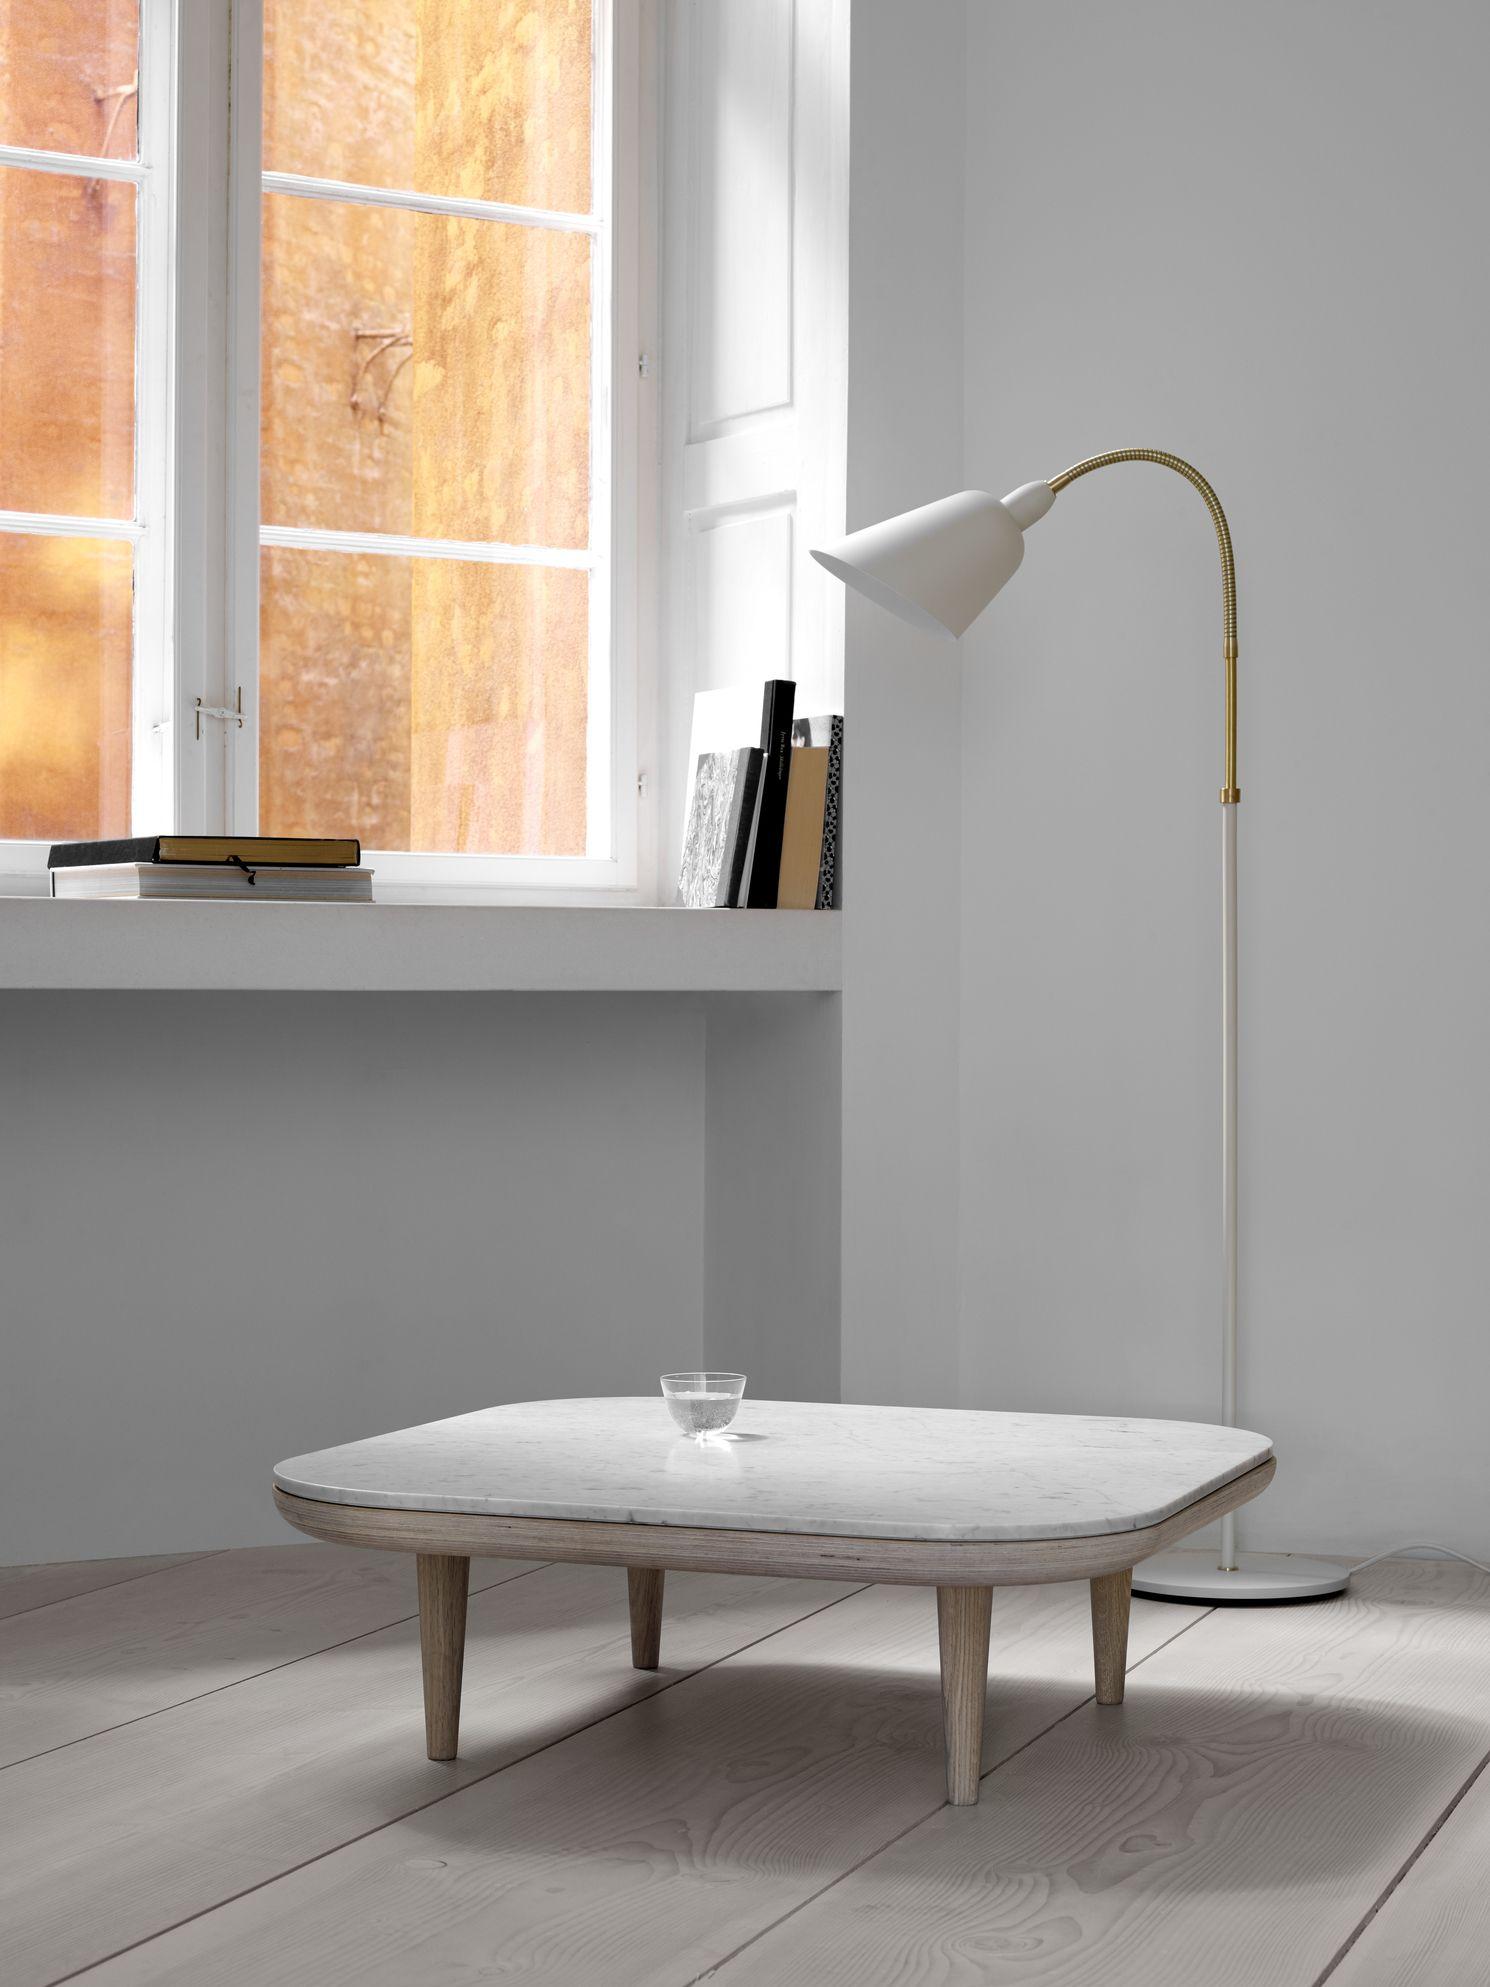 Bellevue Lamp Aj7 By Arne Jacobsen In 2020 Marble Tables Design Scandinavian Interior Design Coffee Table